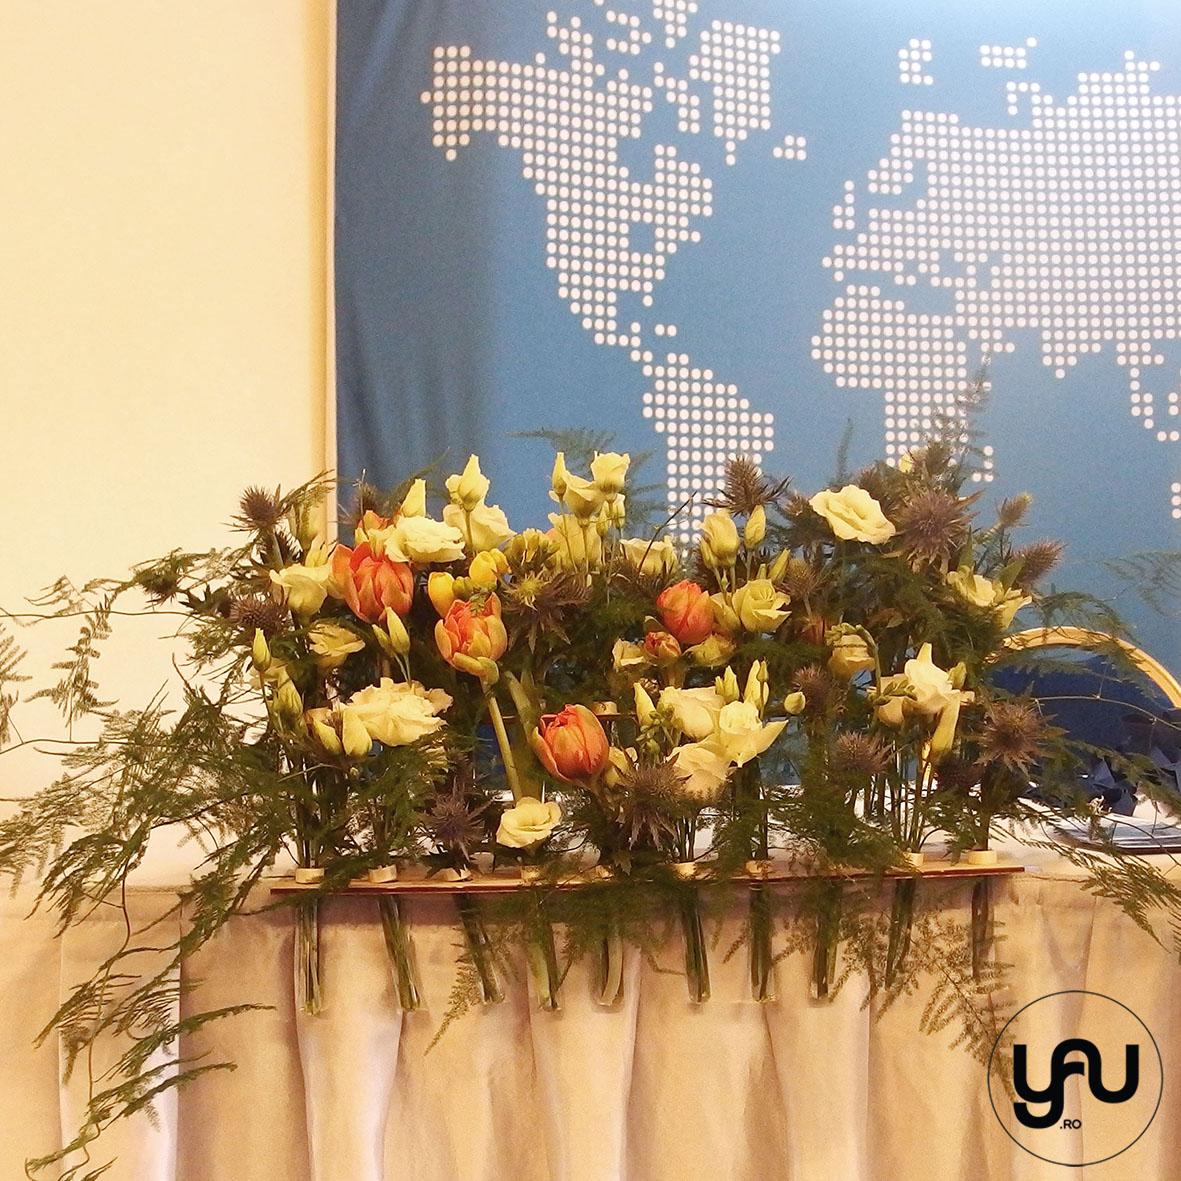 lalele-lemn-si-eprubete-_-yau-evenimente-2016-_-crowne-plaza-_-elenatoader-14